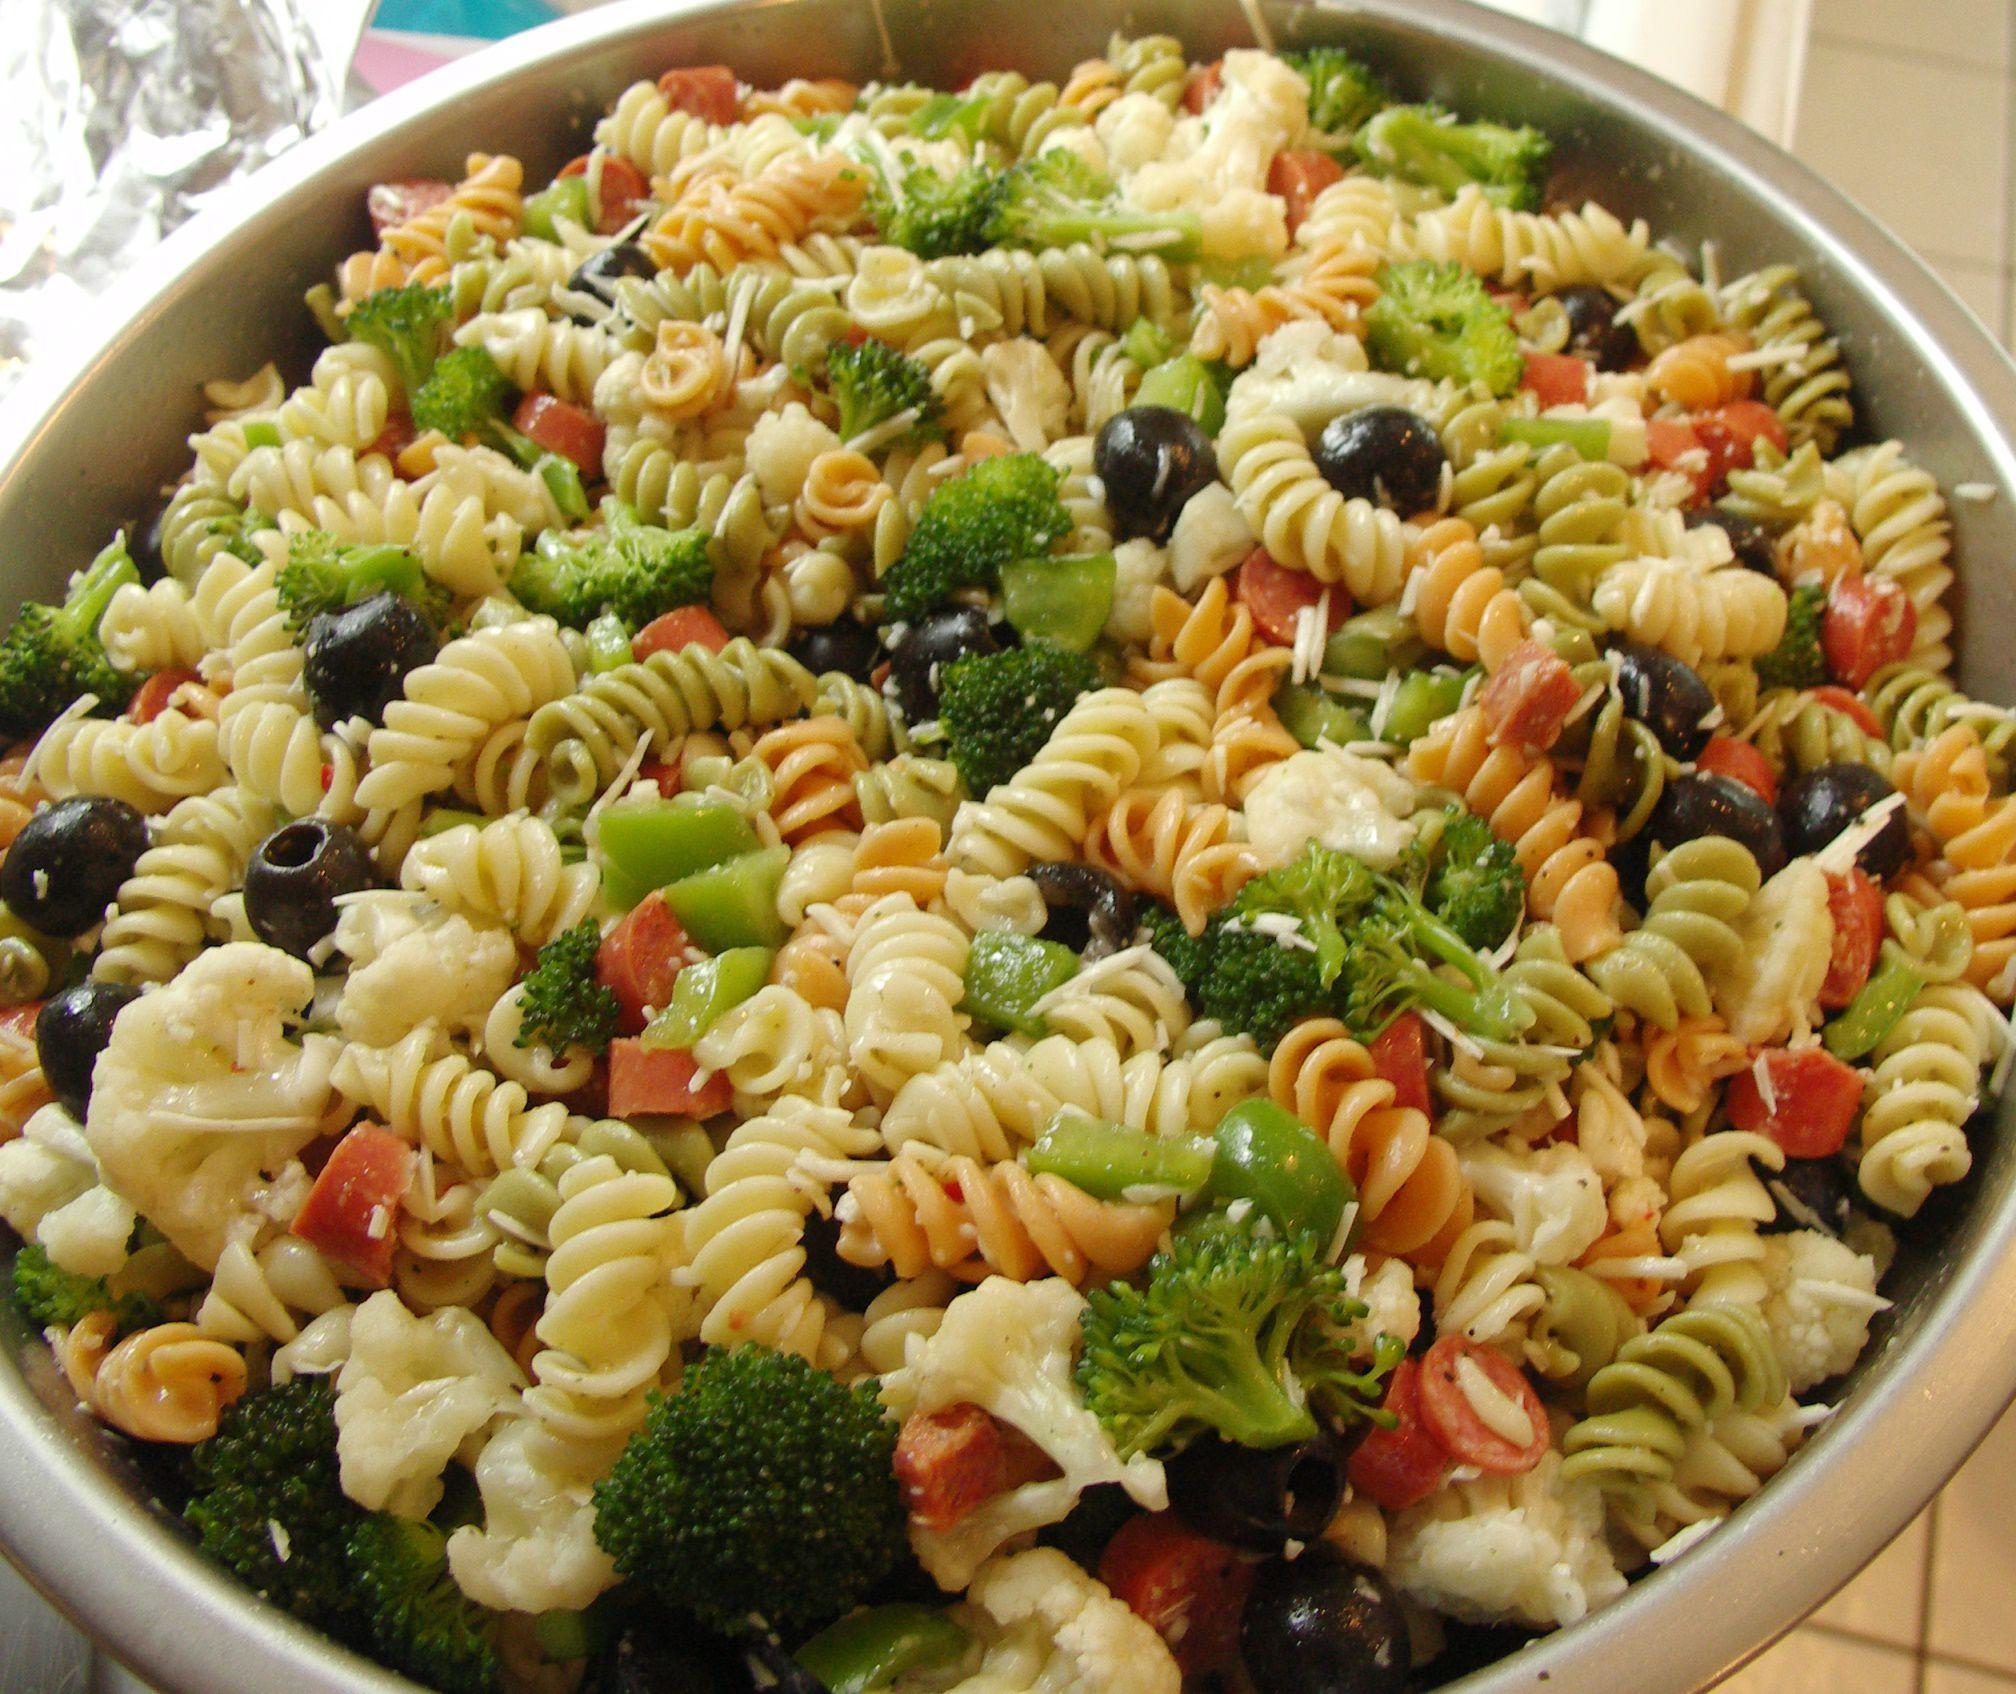 Vegan Pasta Salad  Fat Free Vegan Pasta Salad Recipe